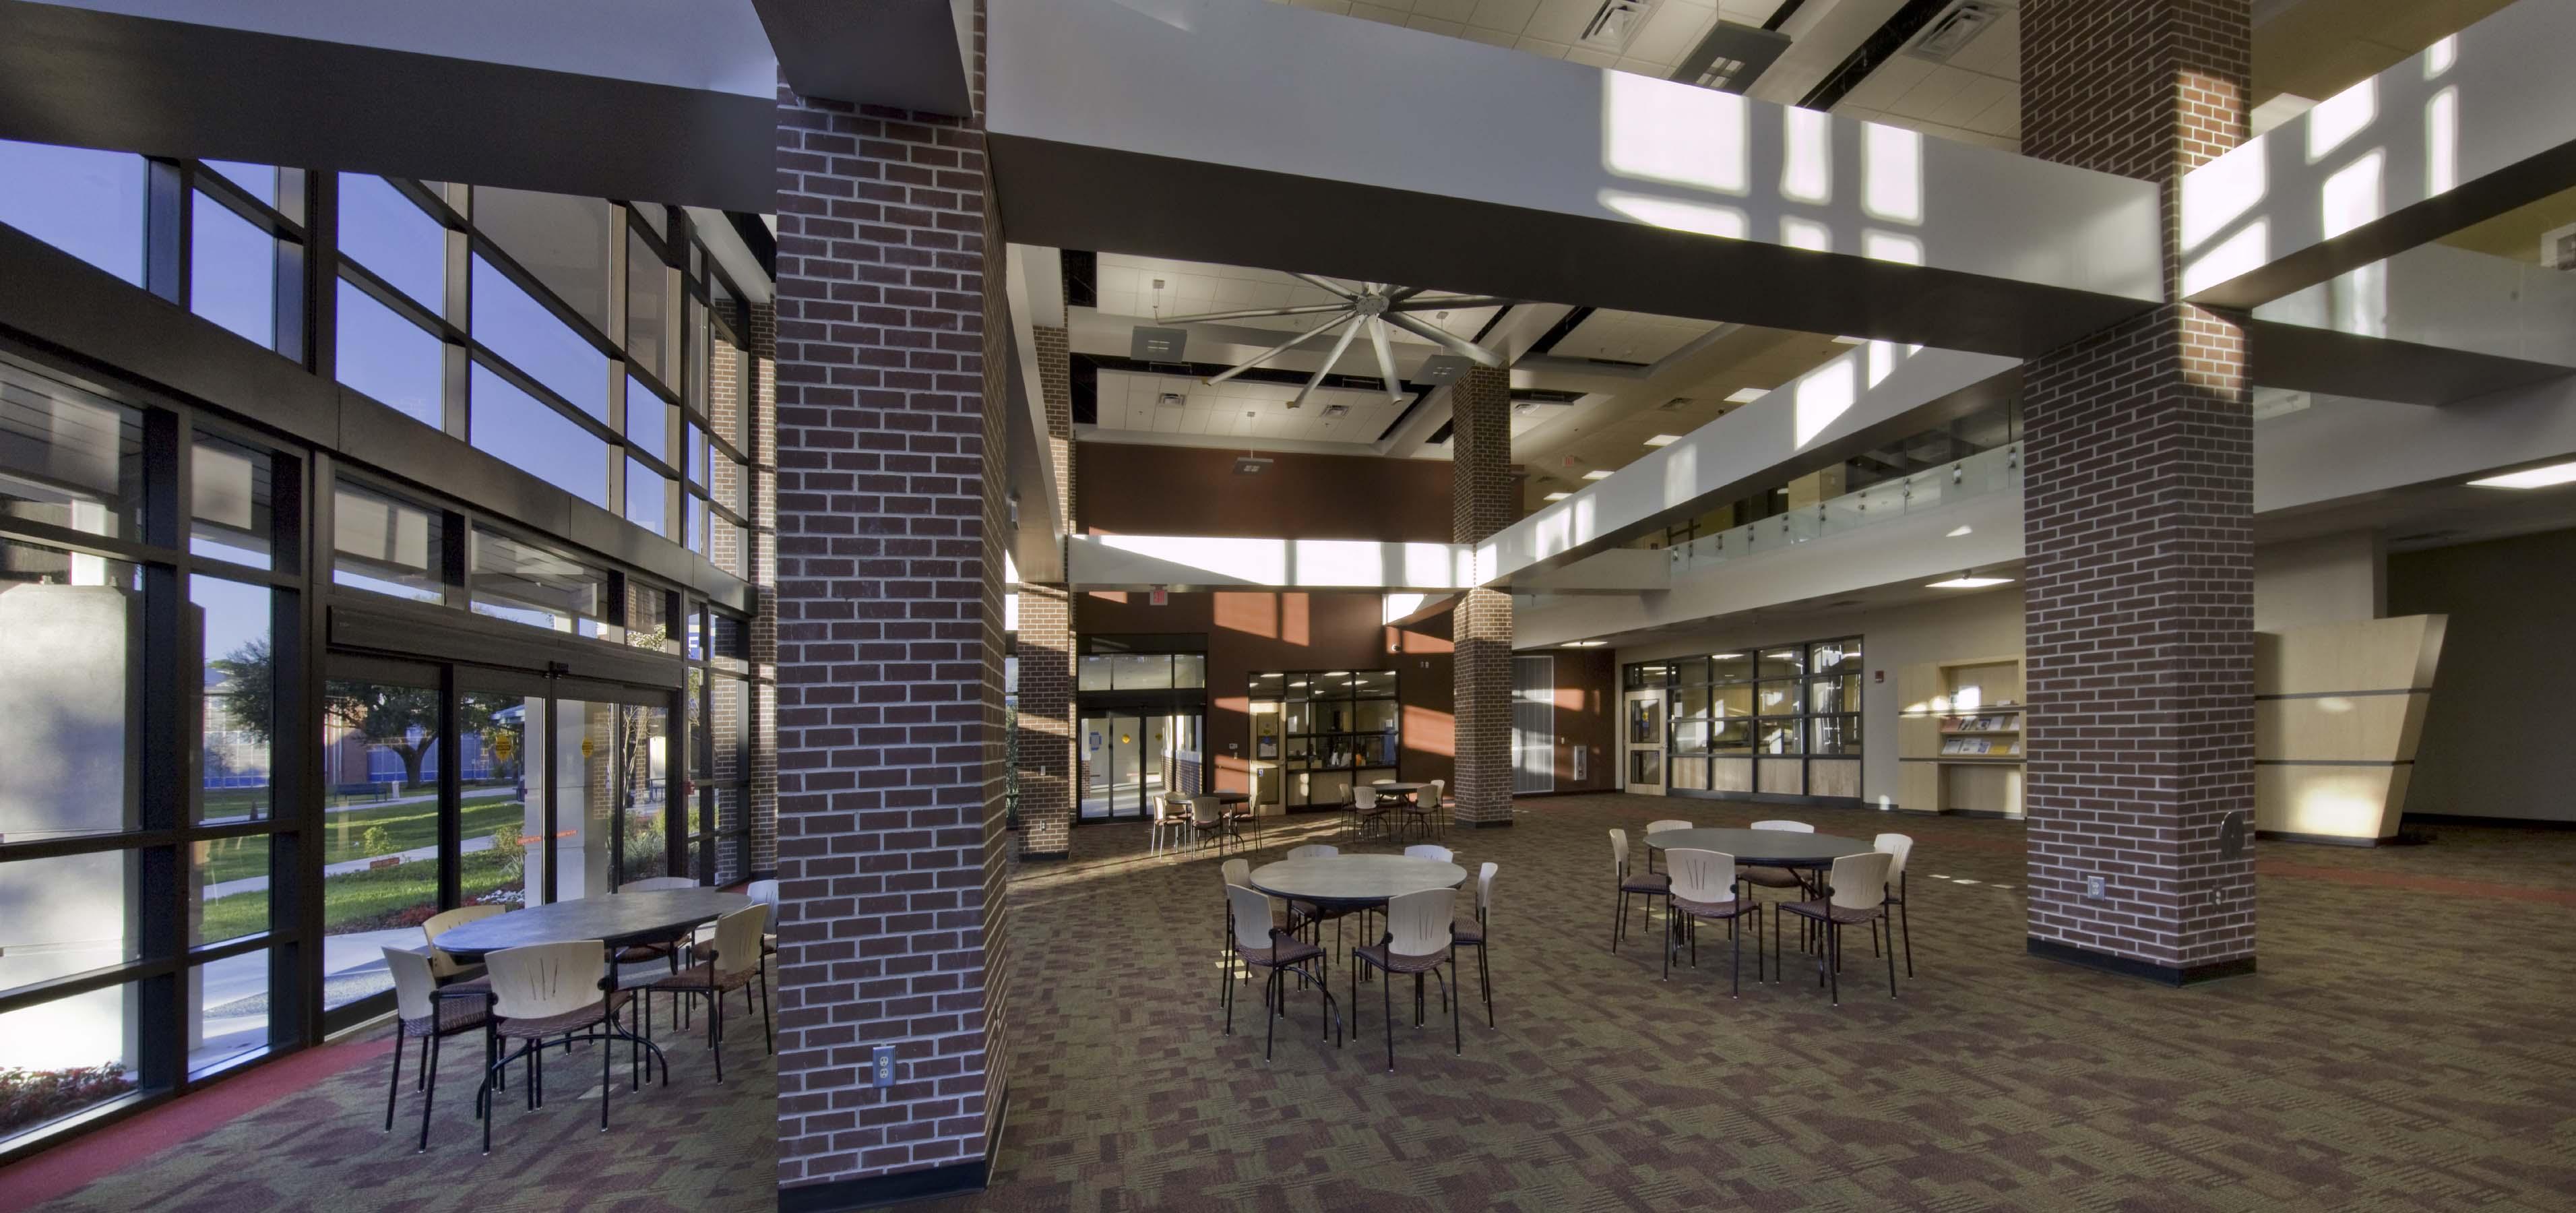 SPC Student Center 06